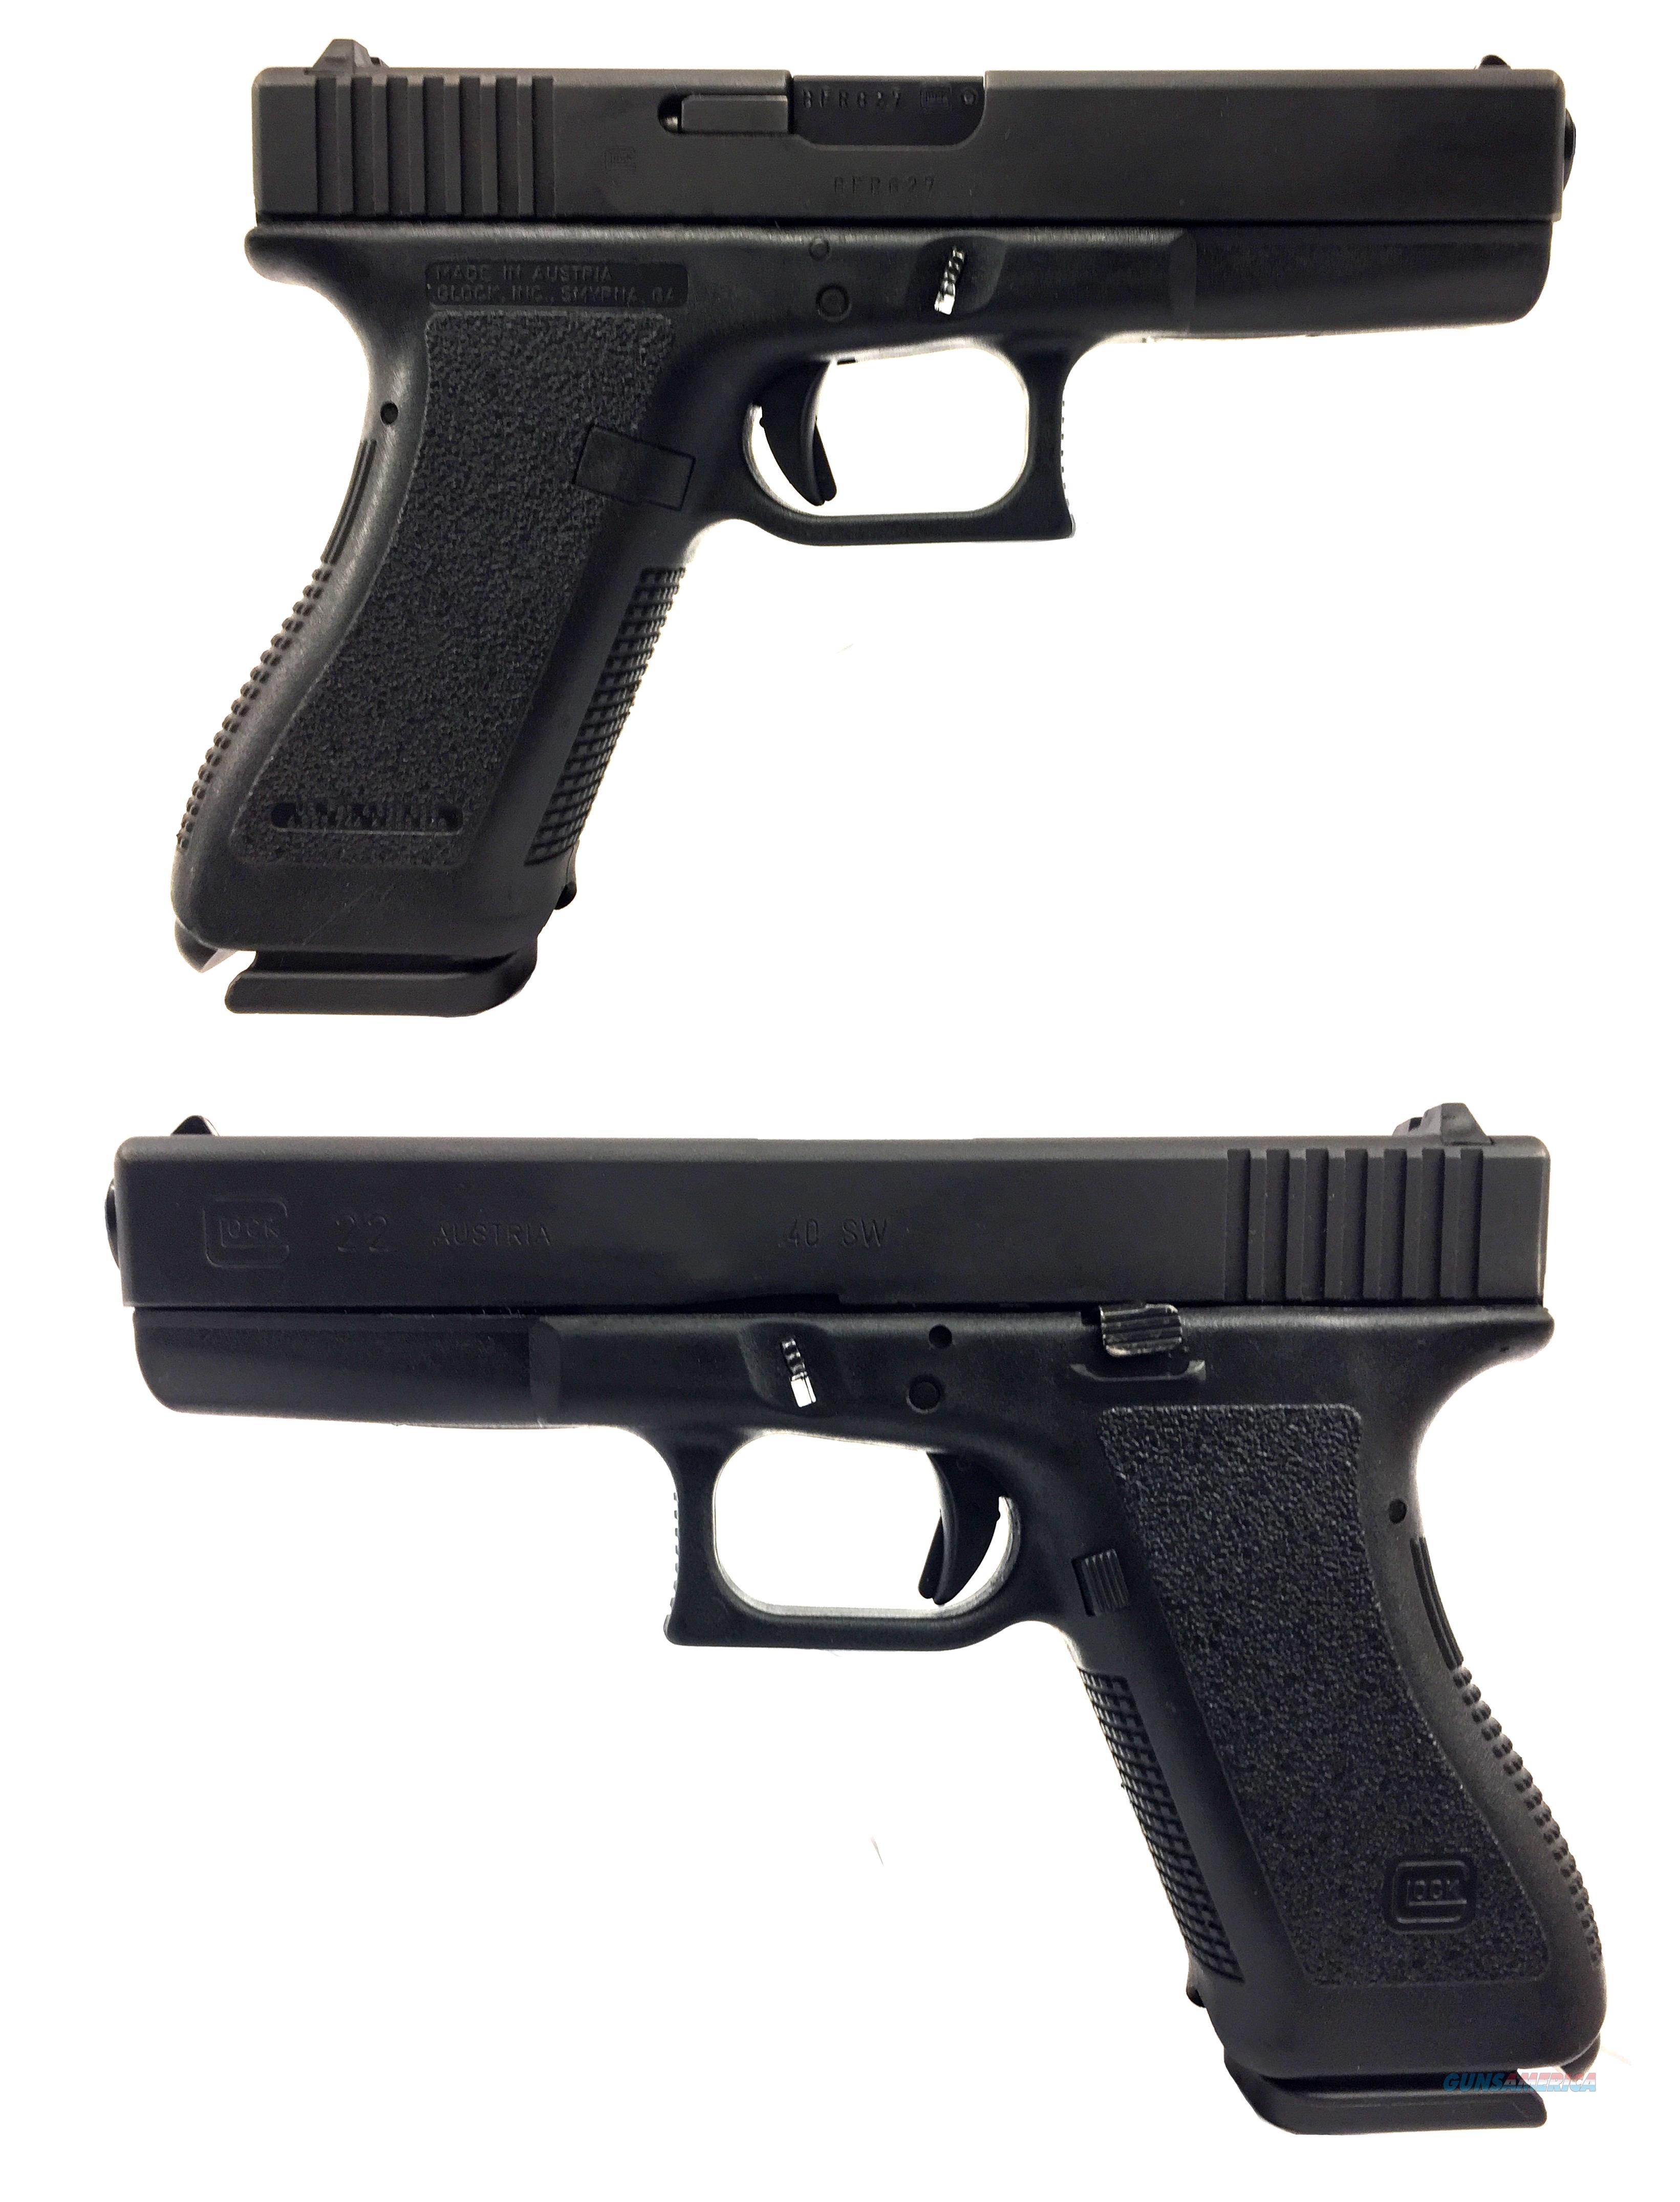 Glock 22 Gen 2  Guns > Pistols > Glock Pistols > 22